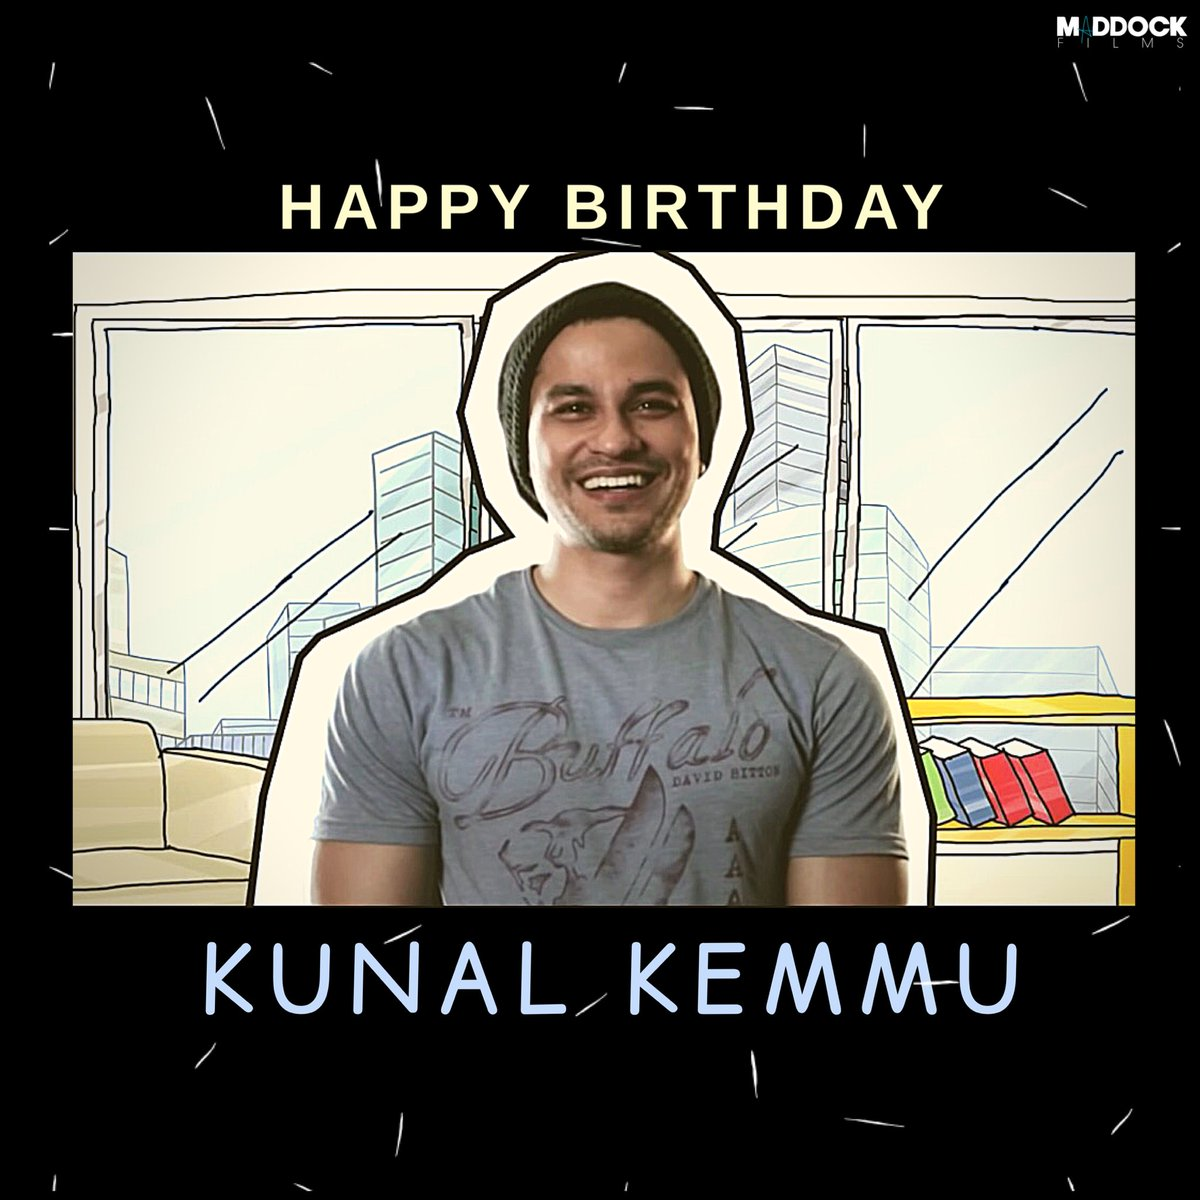 Here's wishing the super talented @kunalkemmu, a very happy birthday!😎 #HappyBirthdayKunalKemmu #GoGoaGone